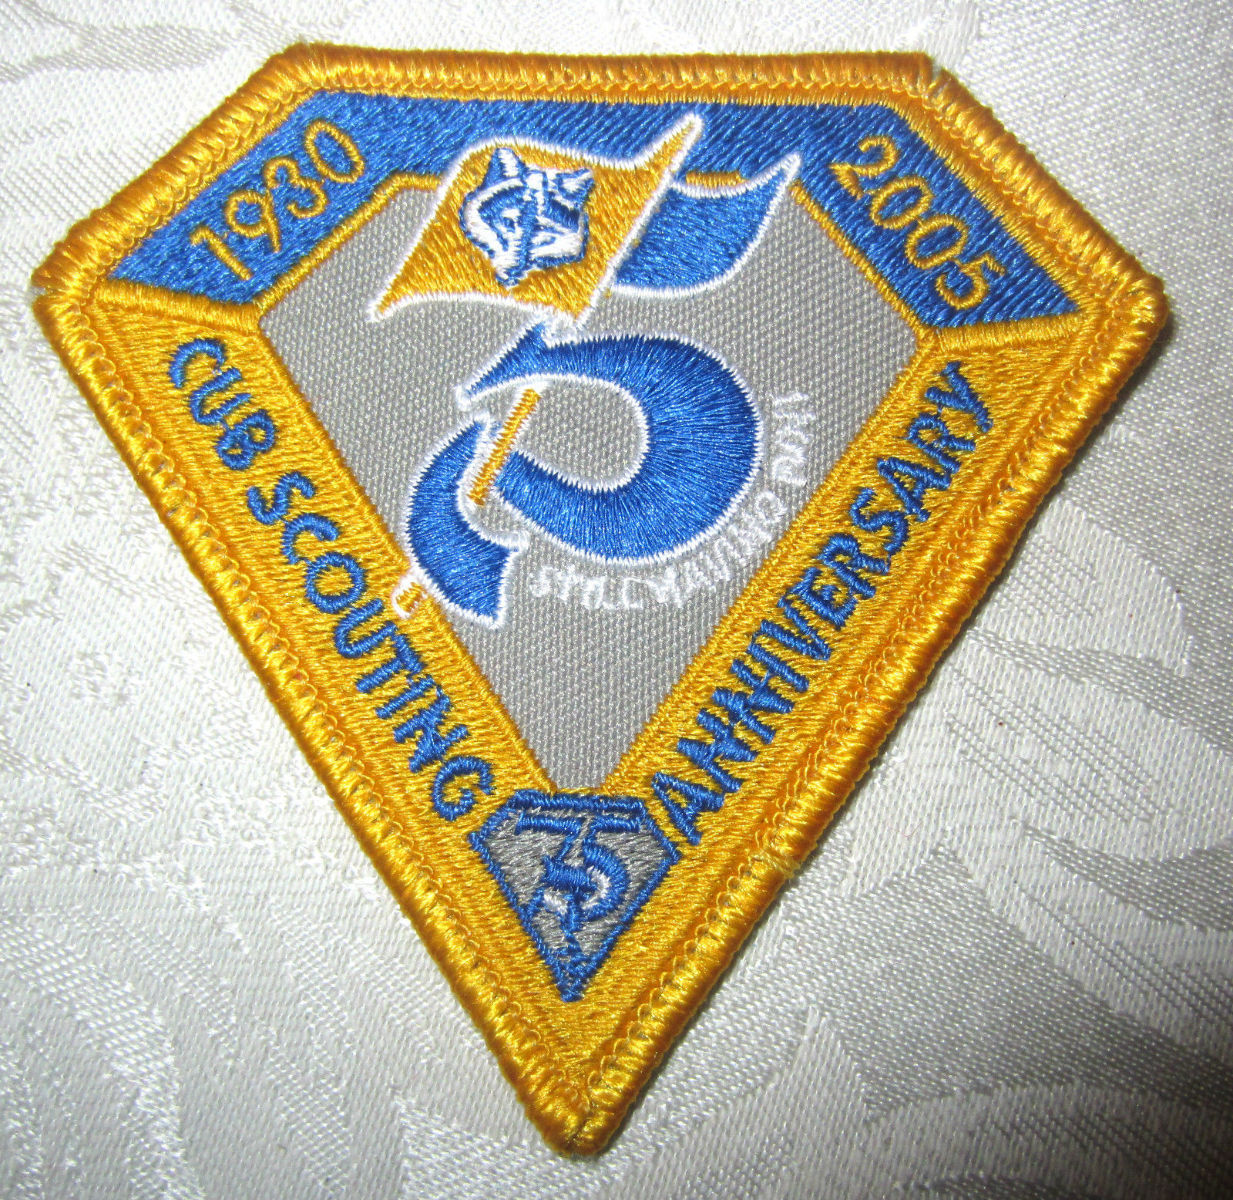 Bsa Boy Scout Uniform Patch Yellow And Blue Cub